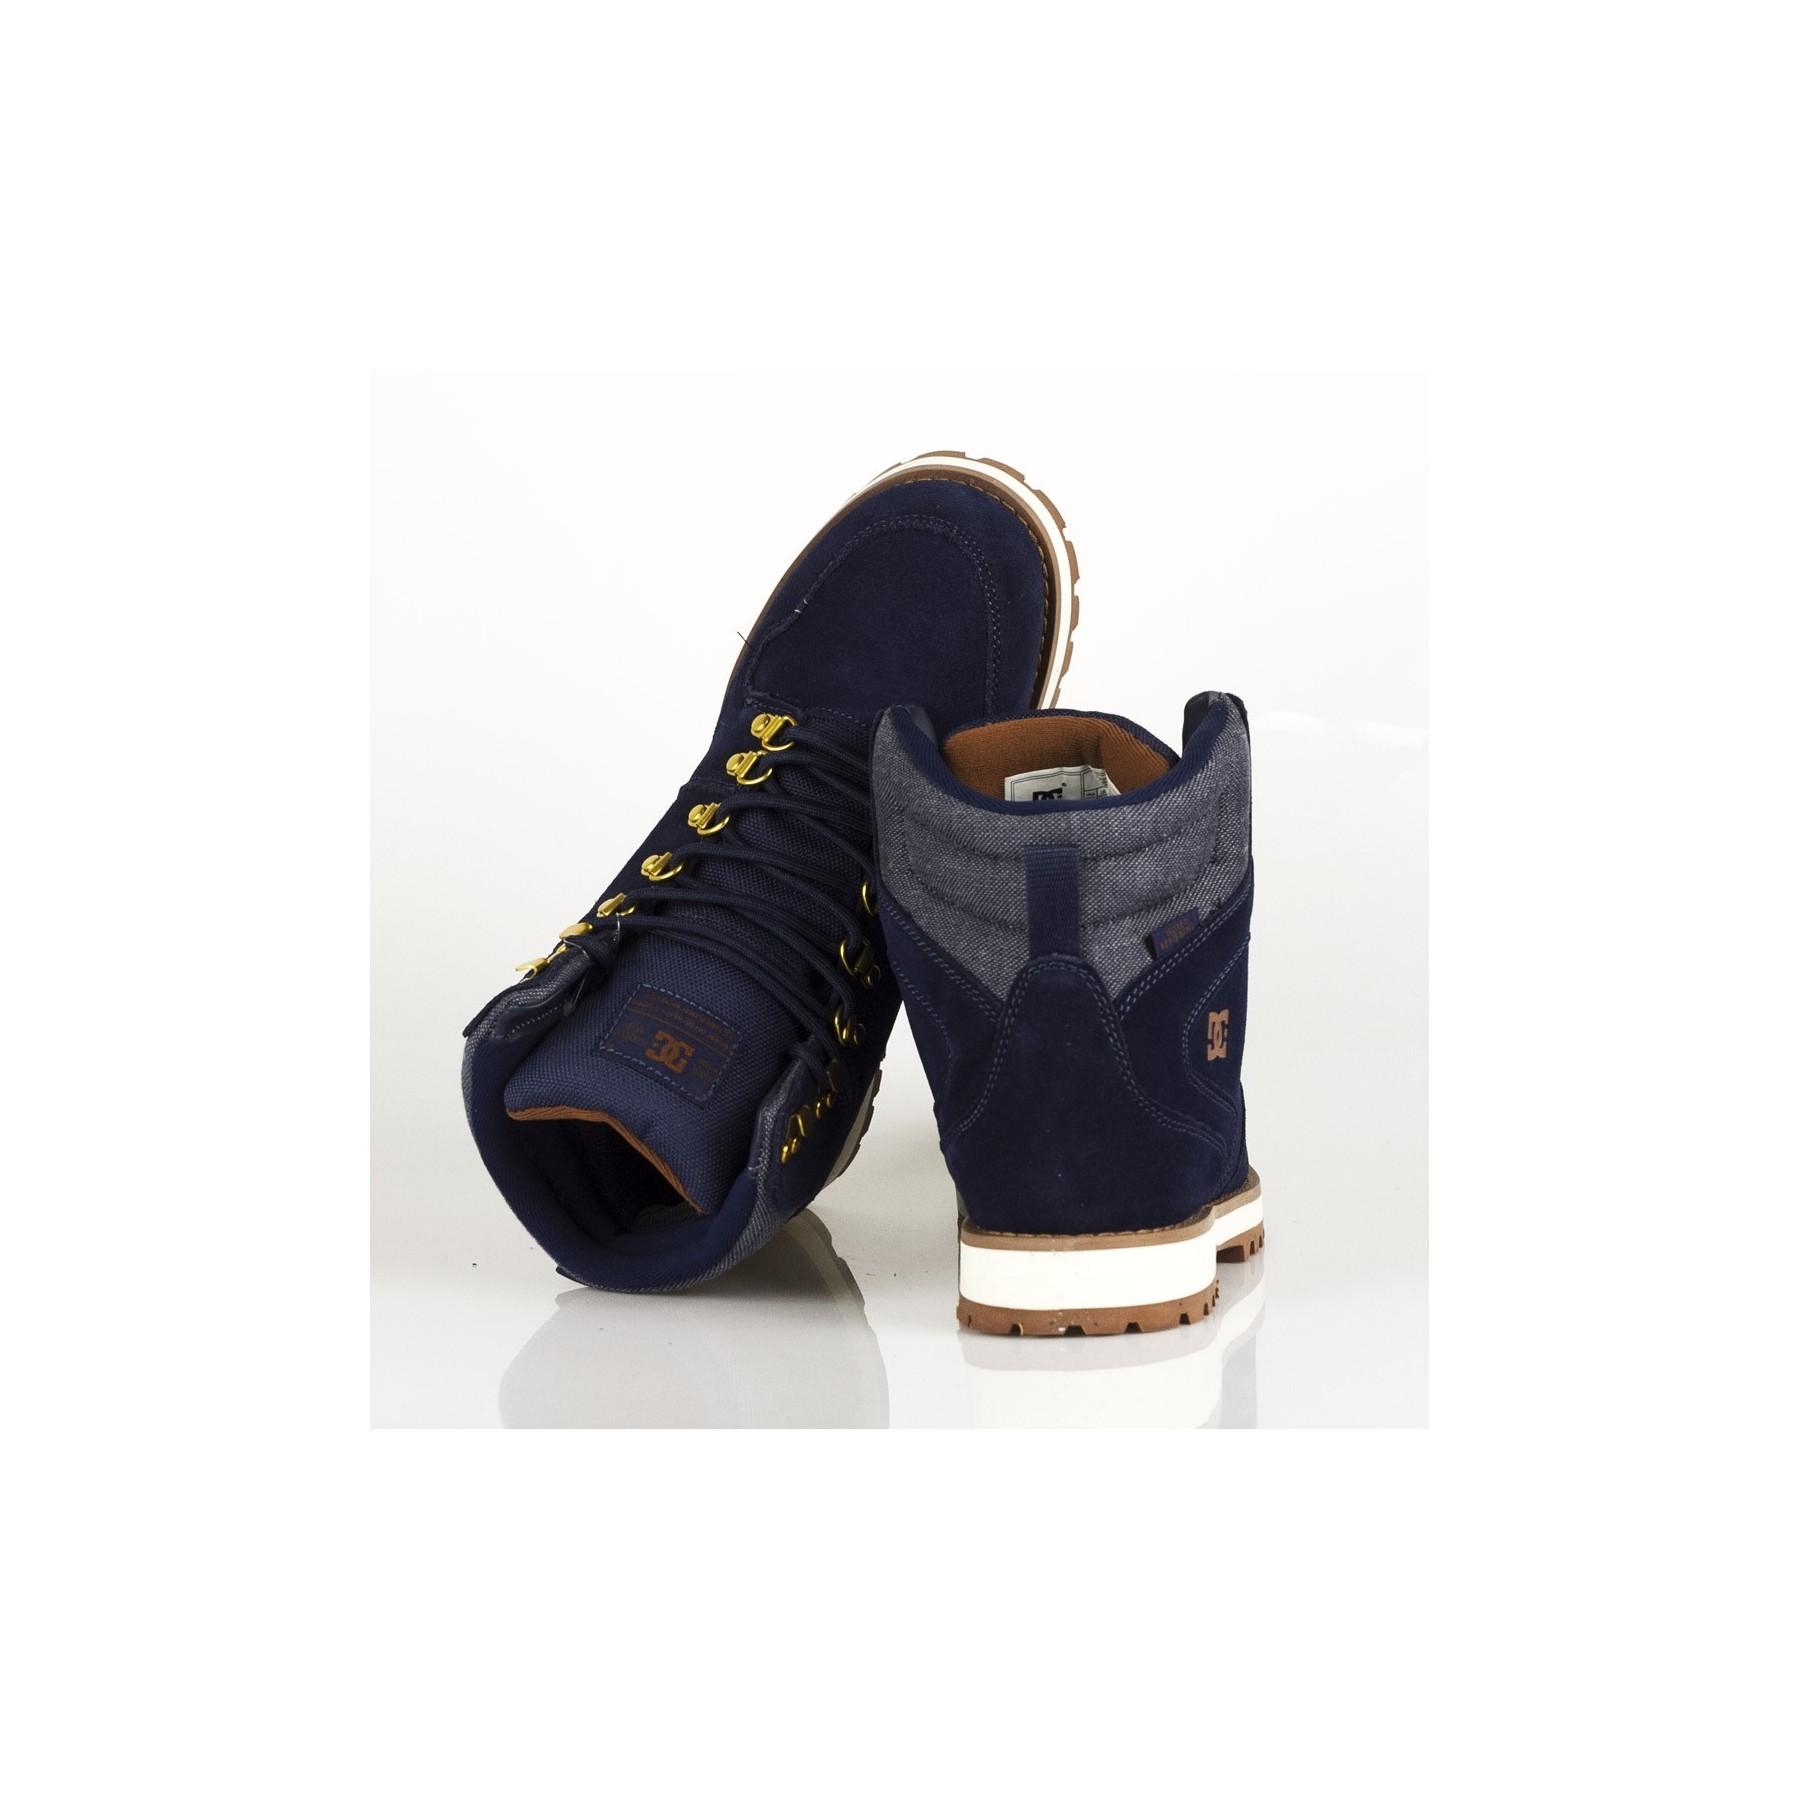 Scarpa dark Boots Navy Peary Chocolate Outdoor 3cRLqA54j